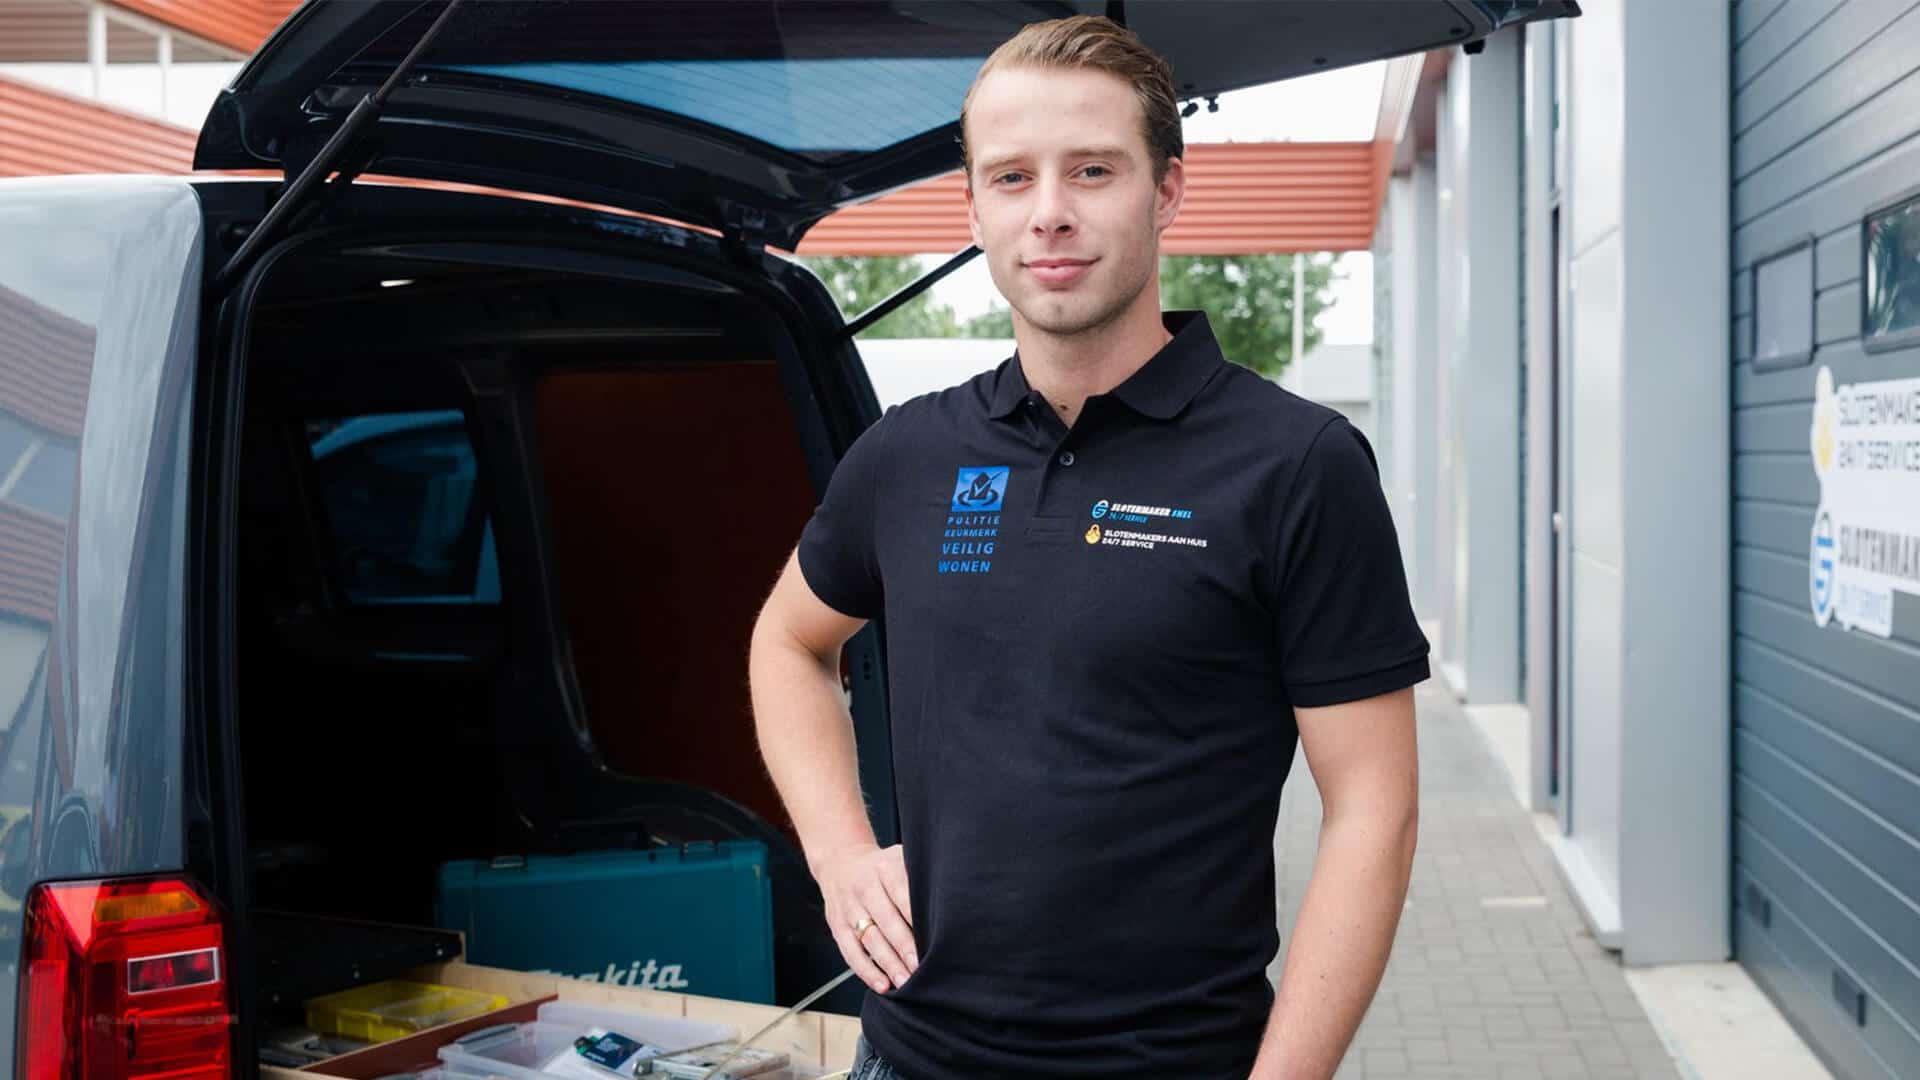 Slotenmaker Waddinxveen